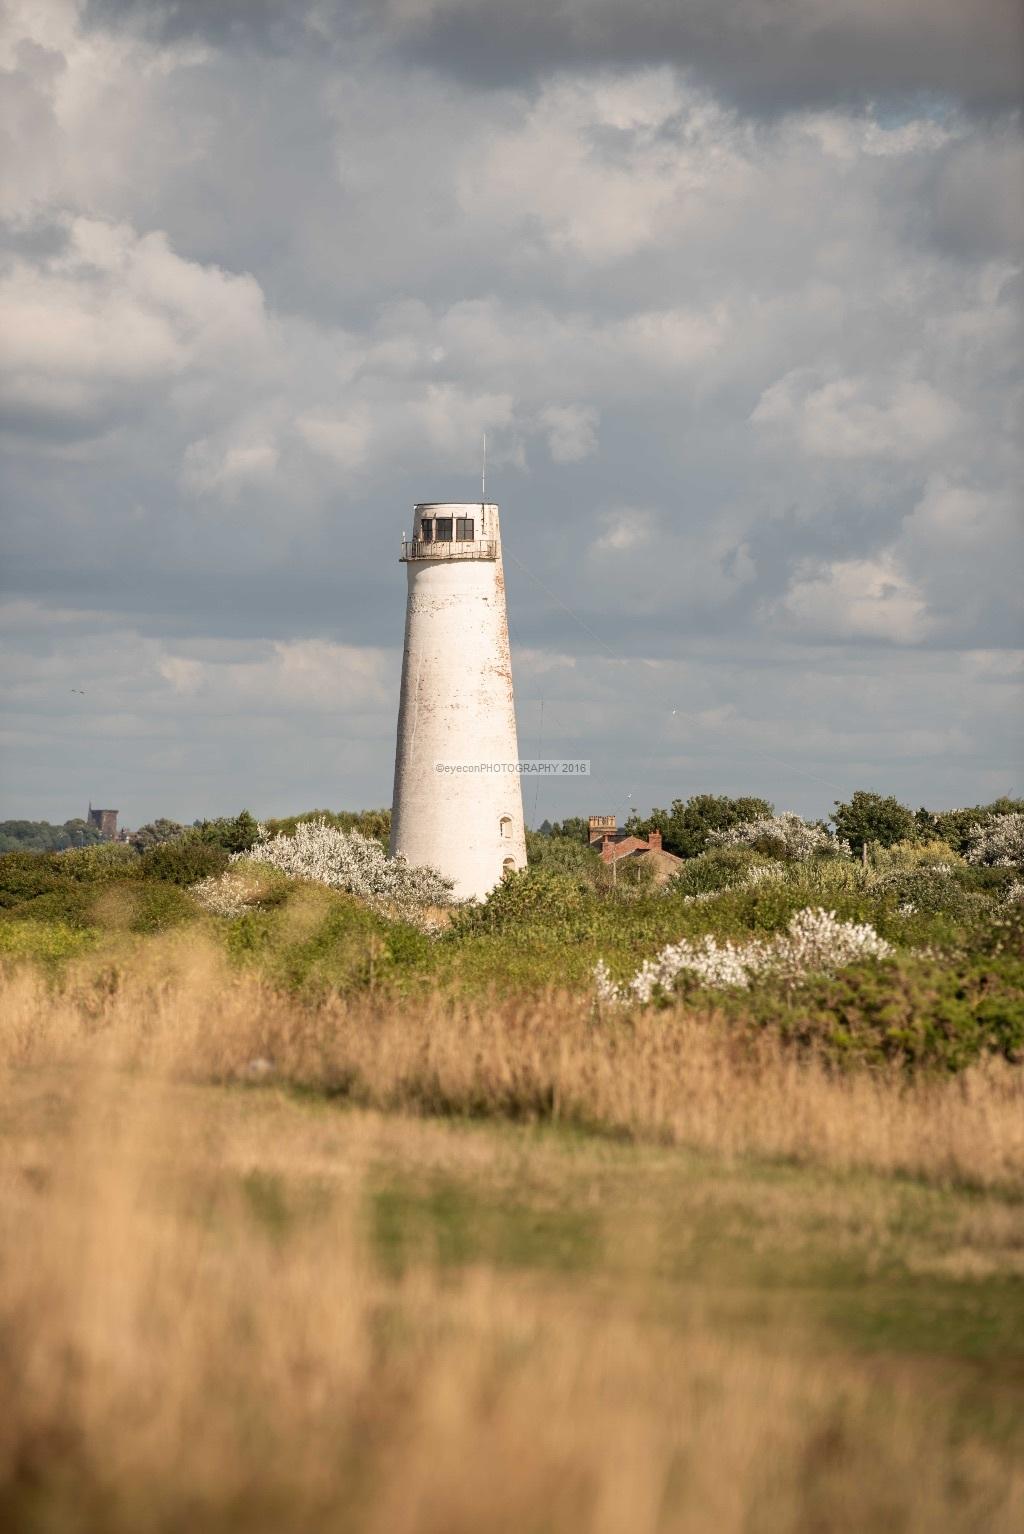 Leasowe Lighthouse